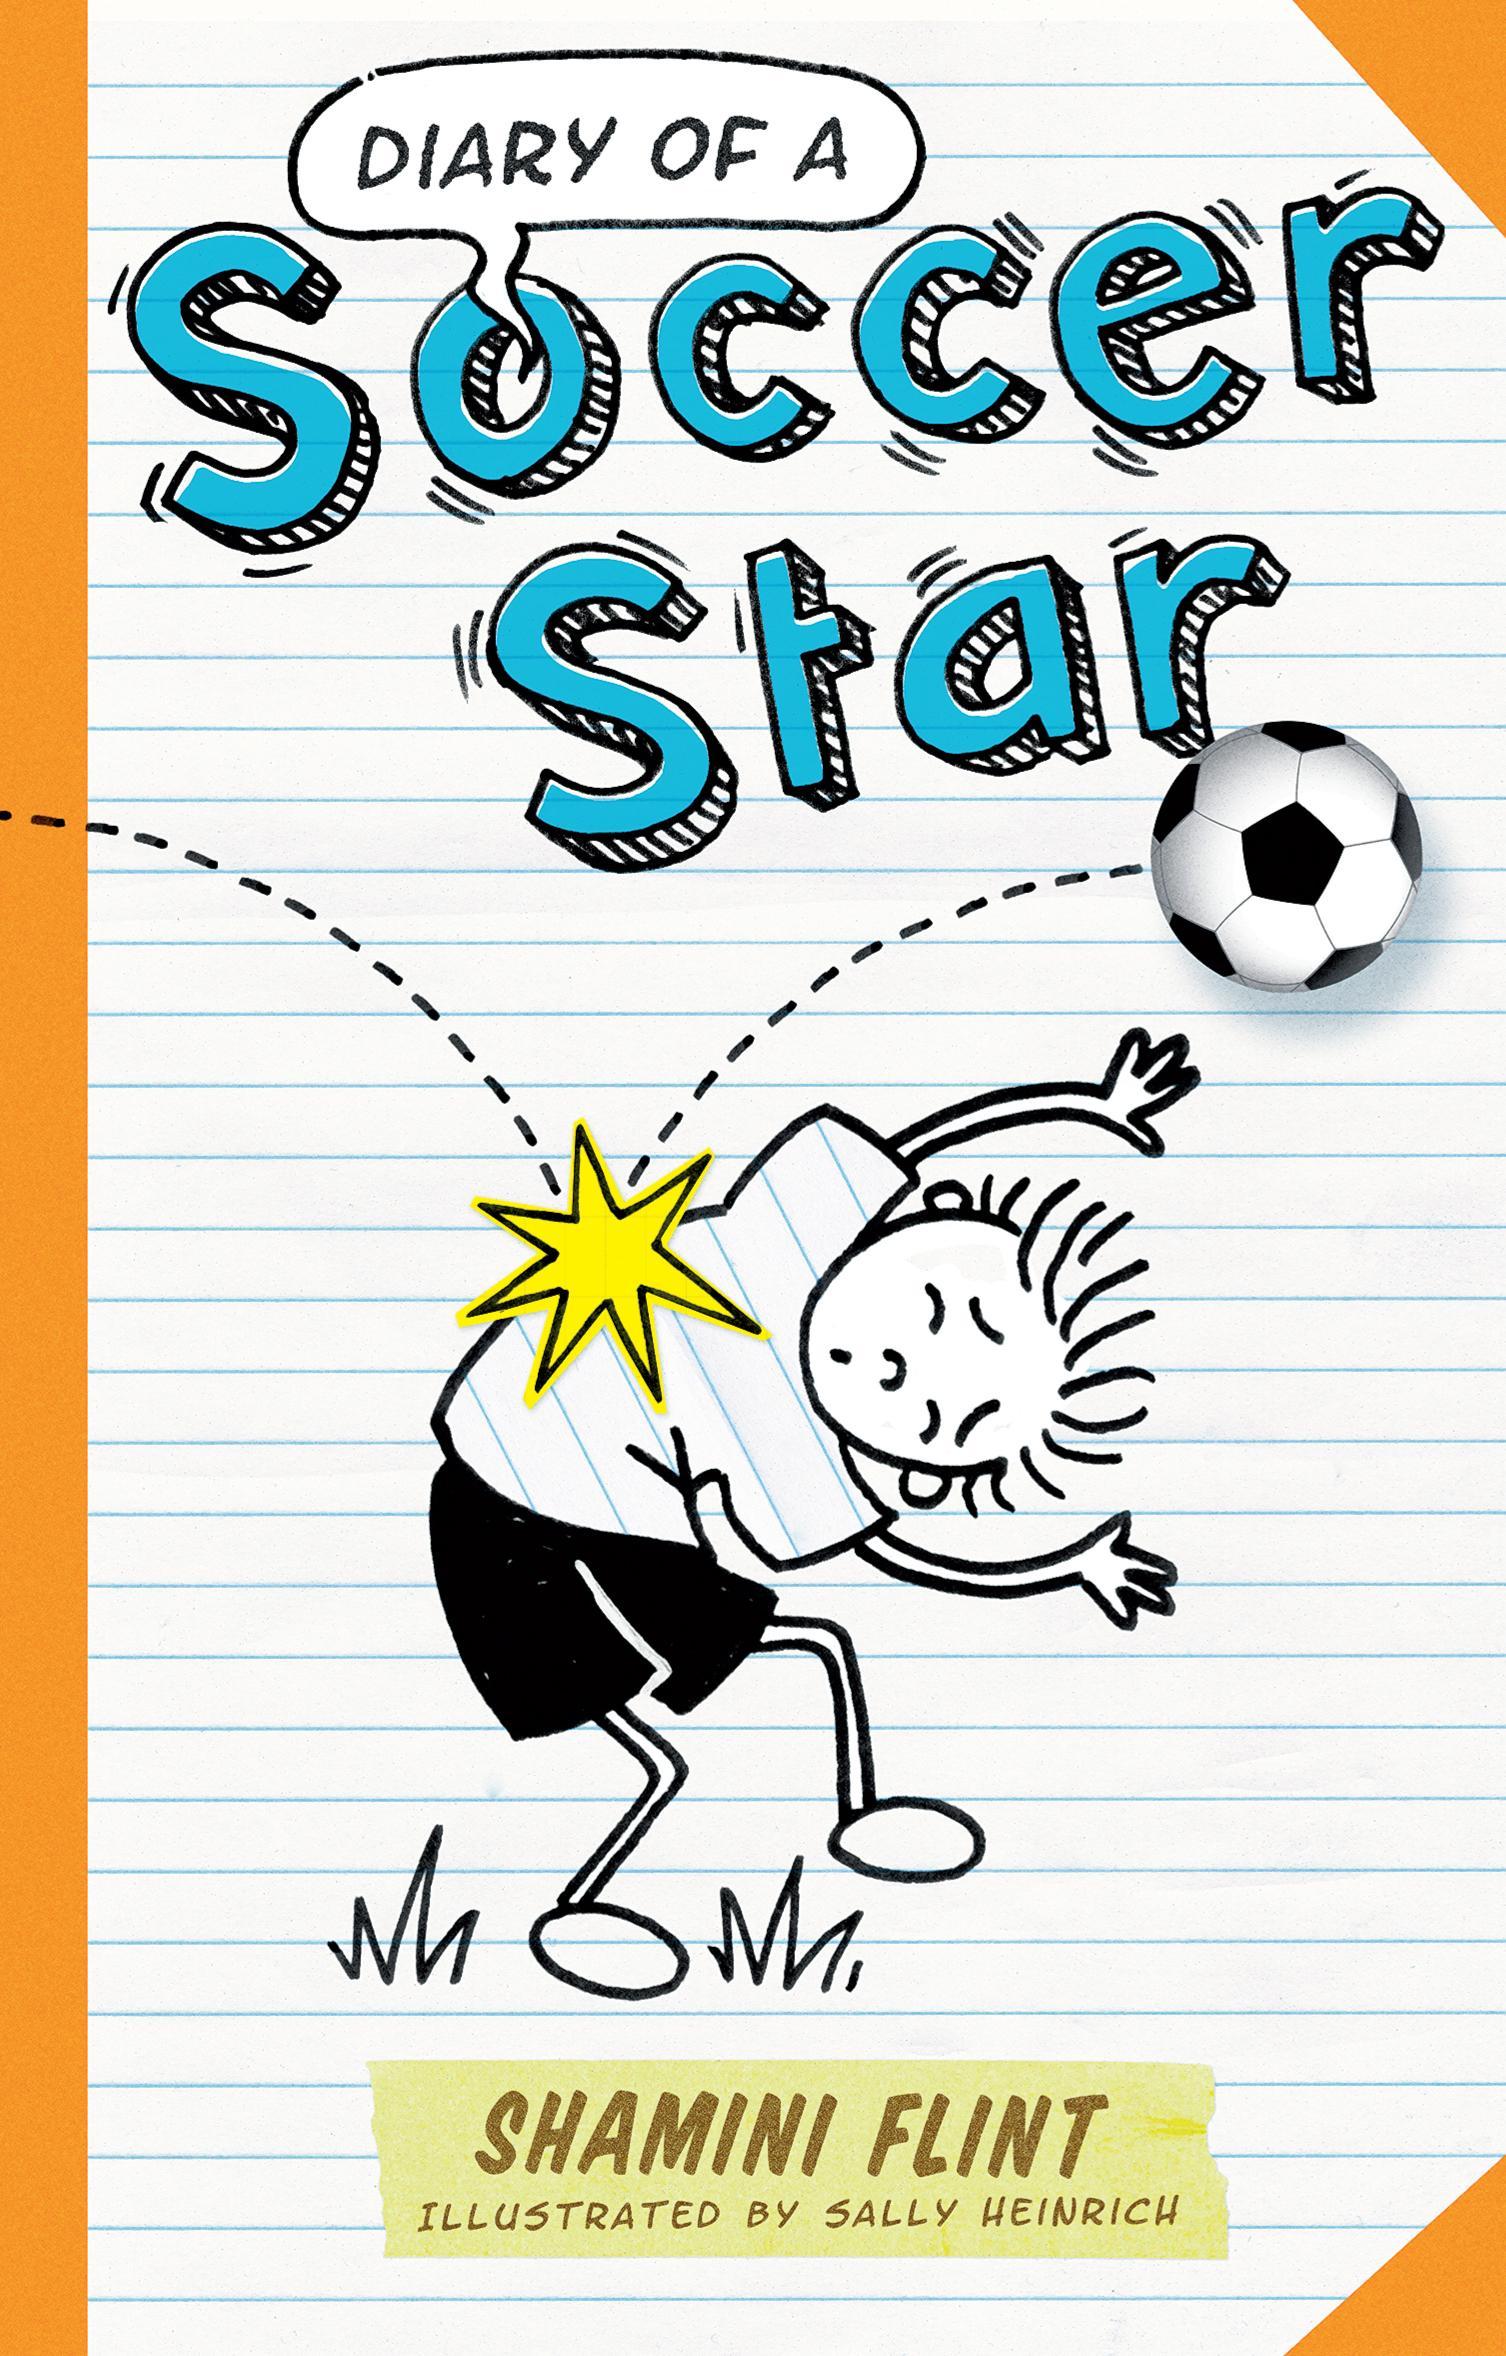 Diary of aSoccerStar